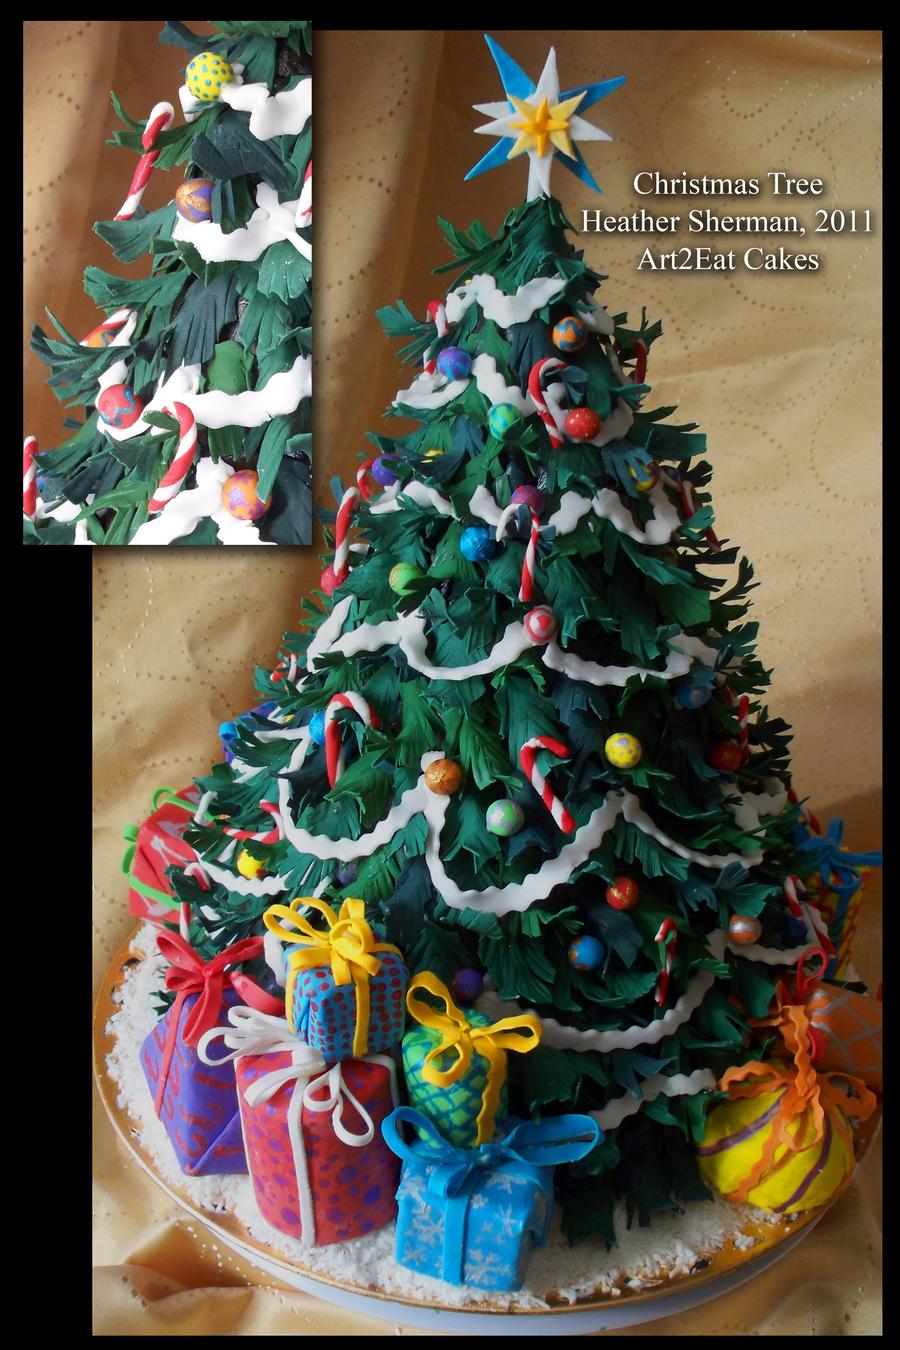 Christmas Tree Cake Cake By H Sherman Art2eat Cakes